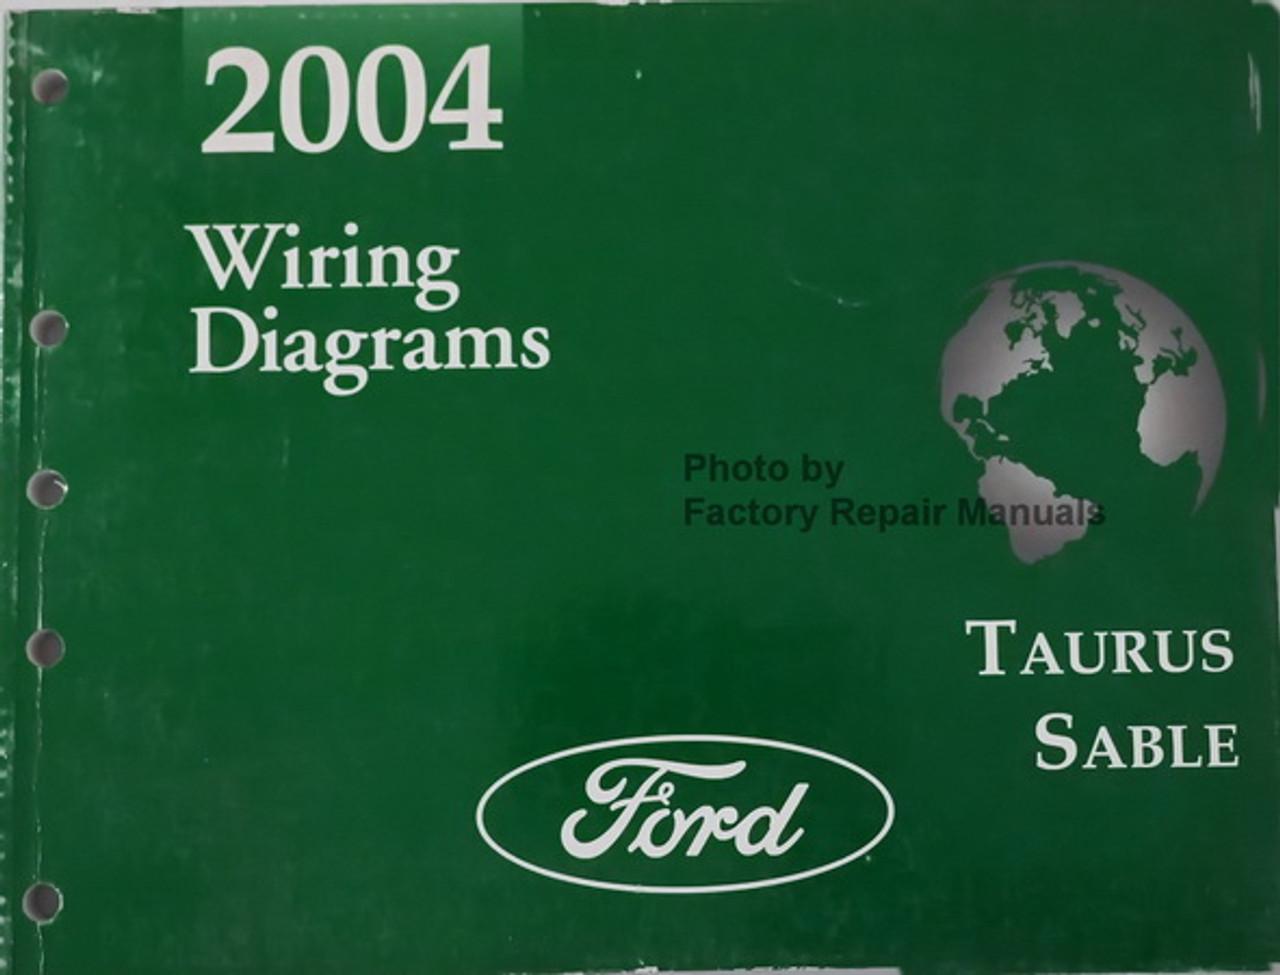 2004 Ford Taurus Mercury Sable Electrical Wiring Diagrams Original Shop Manual